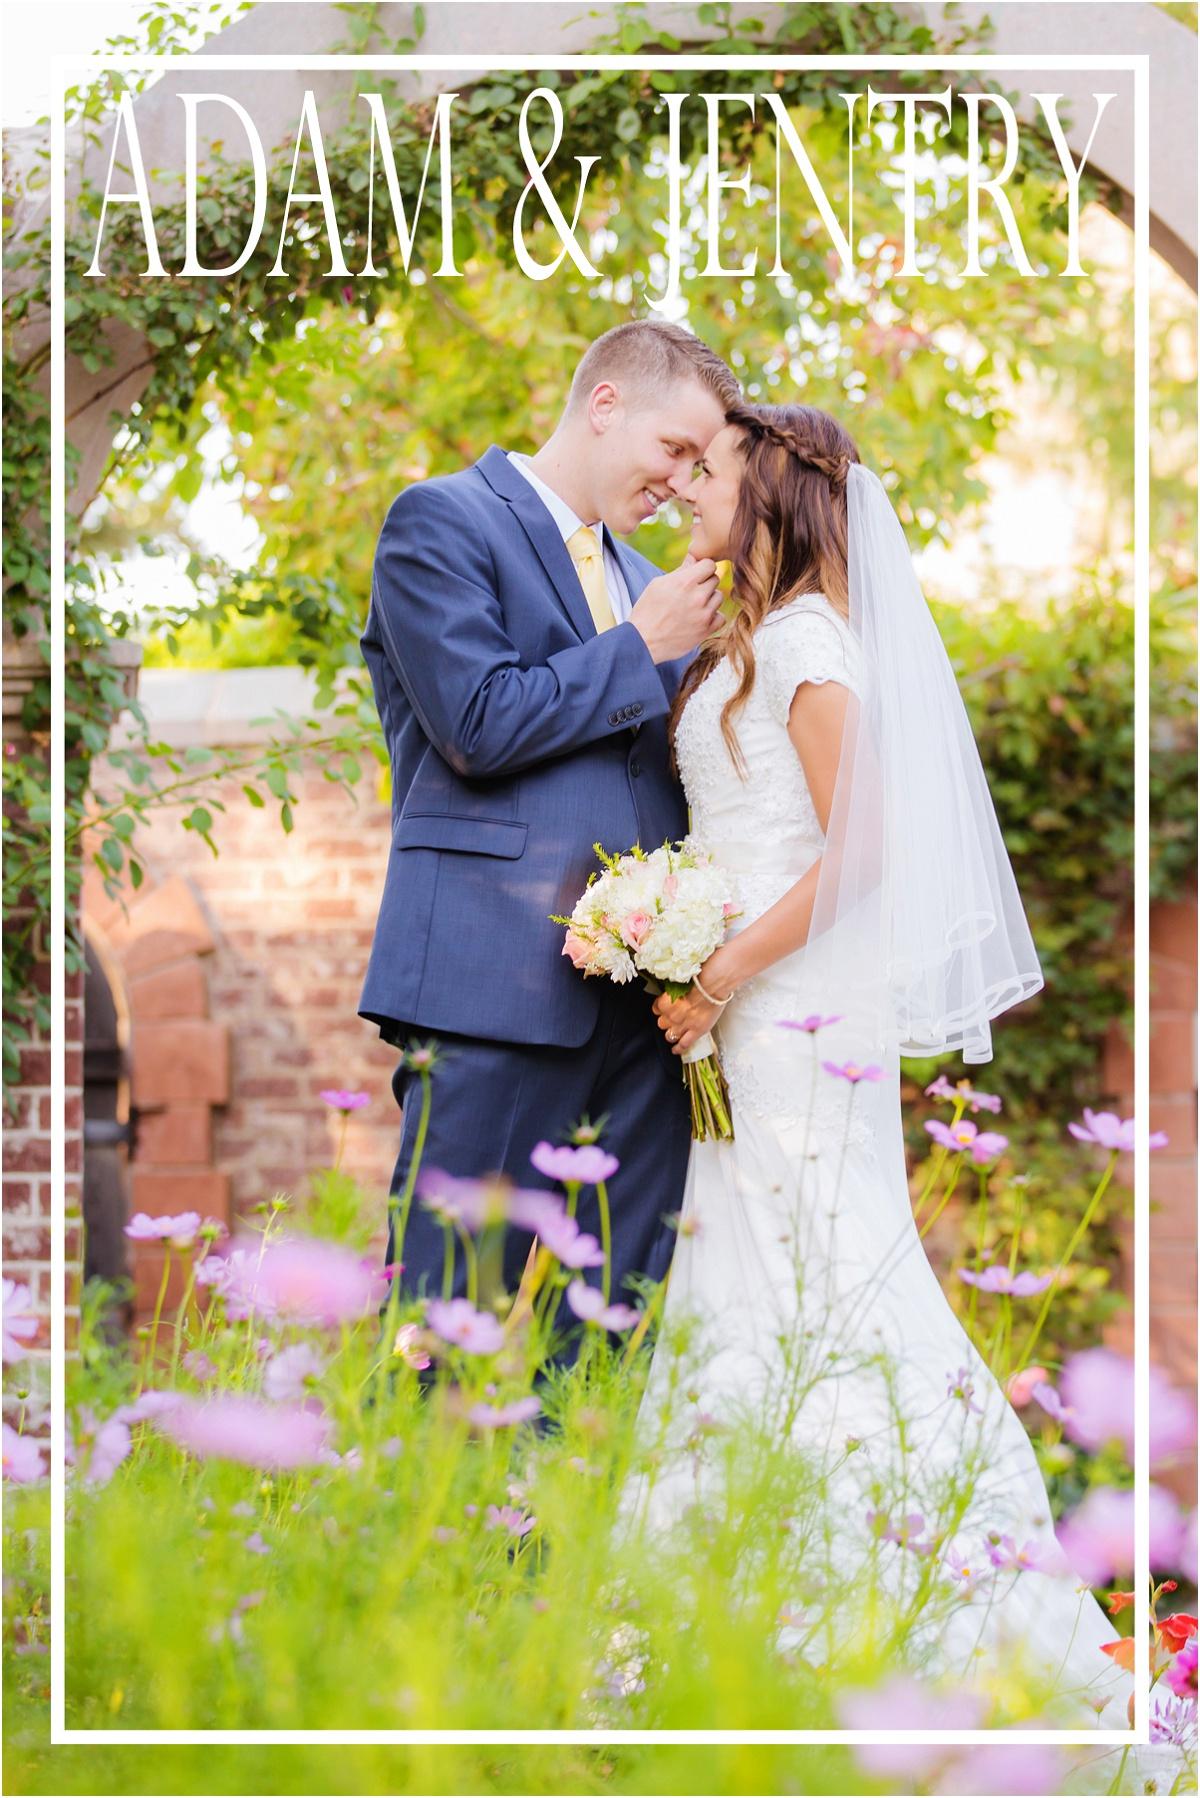 Terra Cooper Photography Weddings Brides 2015_5374.jpg